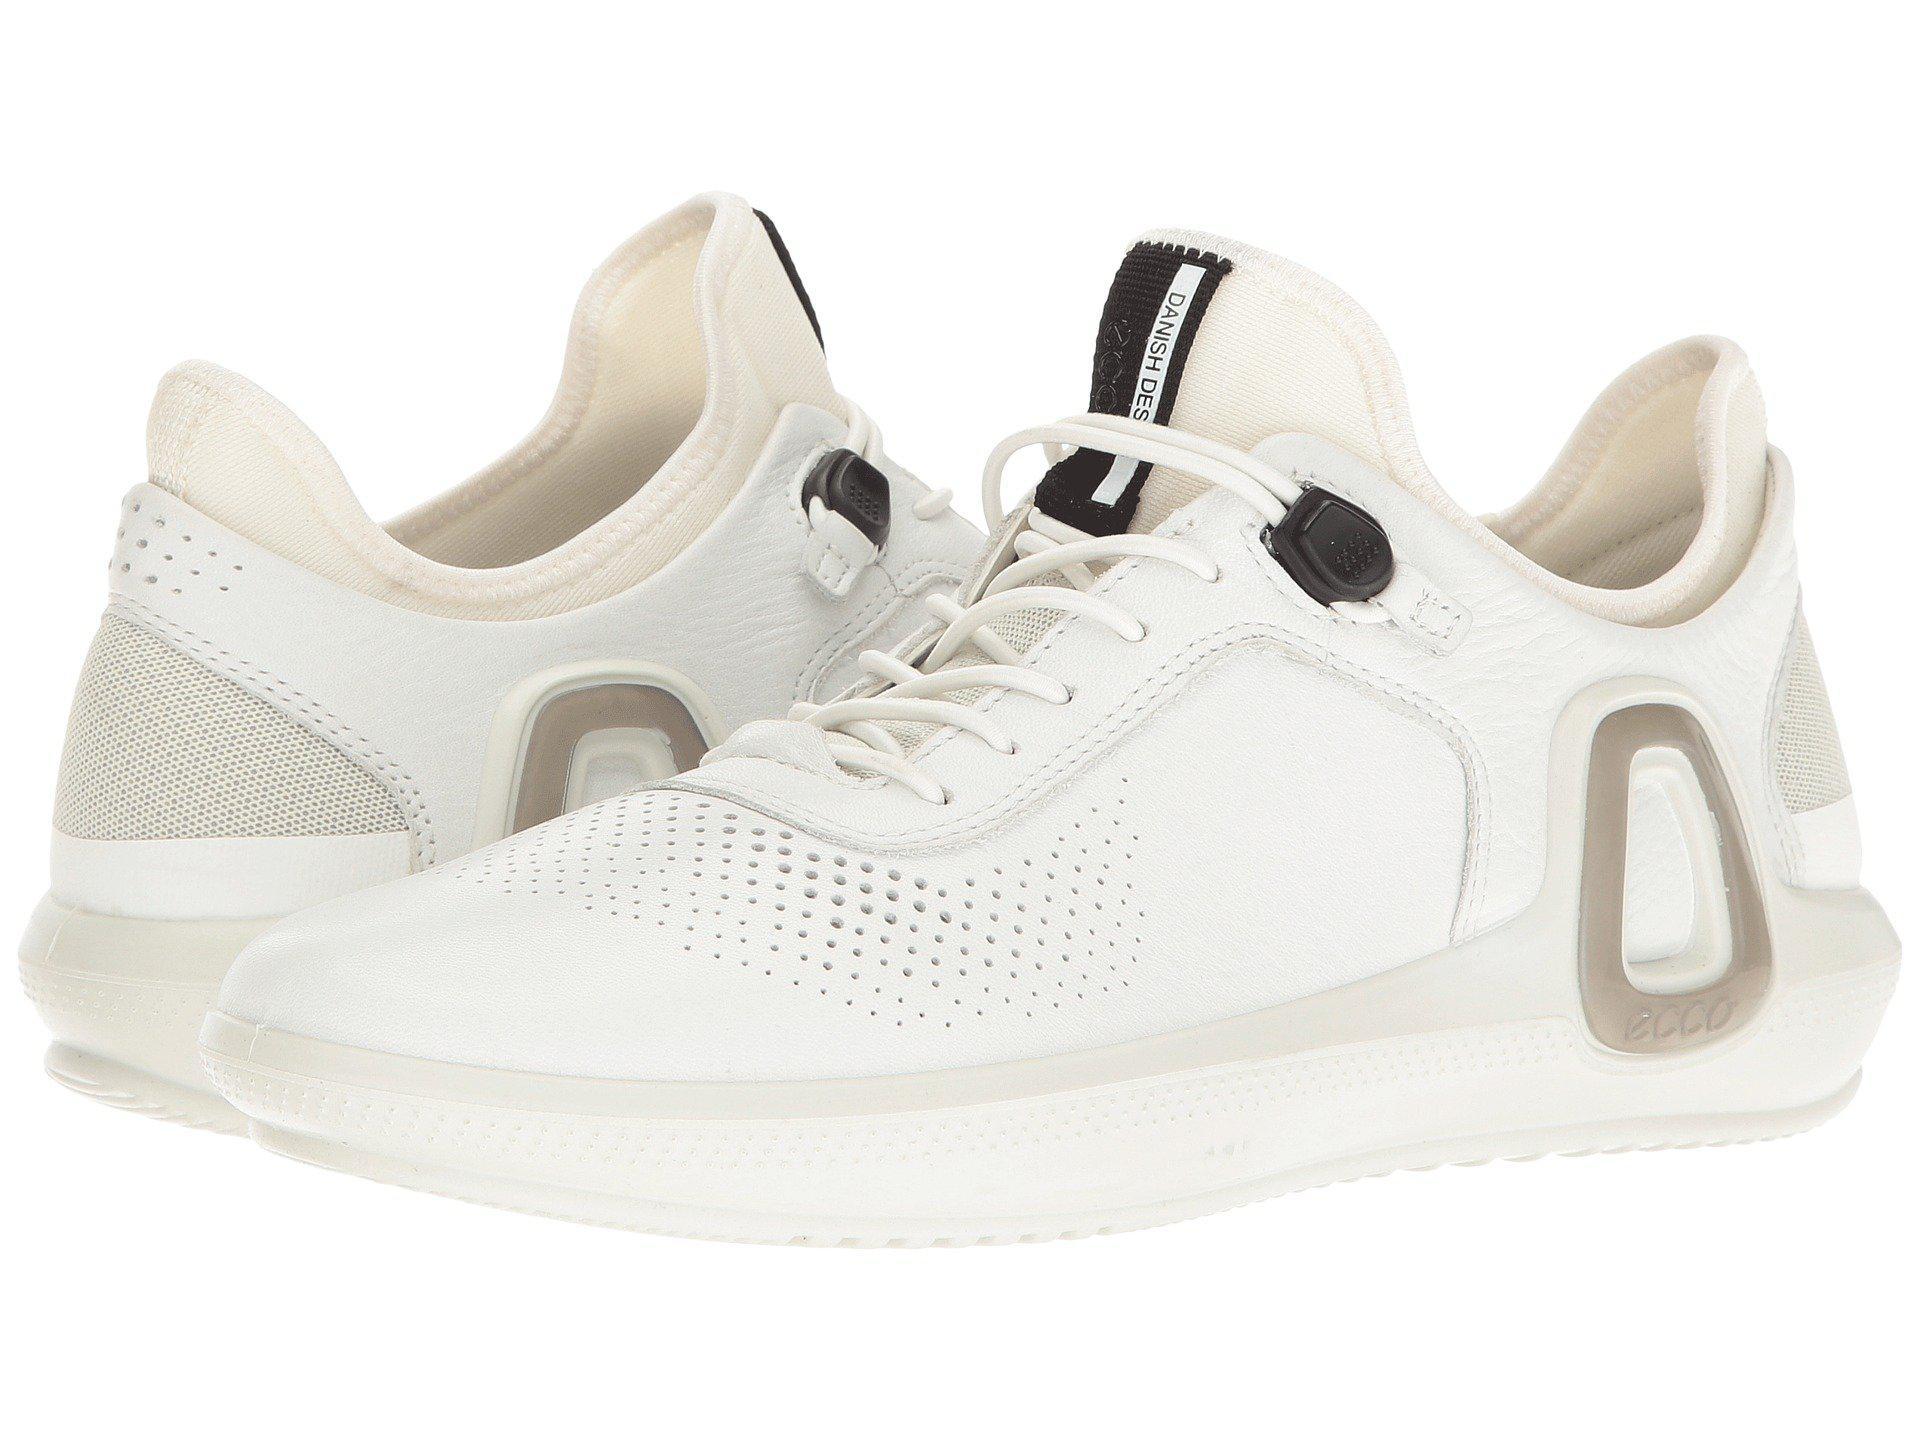 41cb6621e329 Lyst - Ecco Intrinsic 3 Sneaker in White - Save 27%